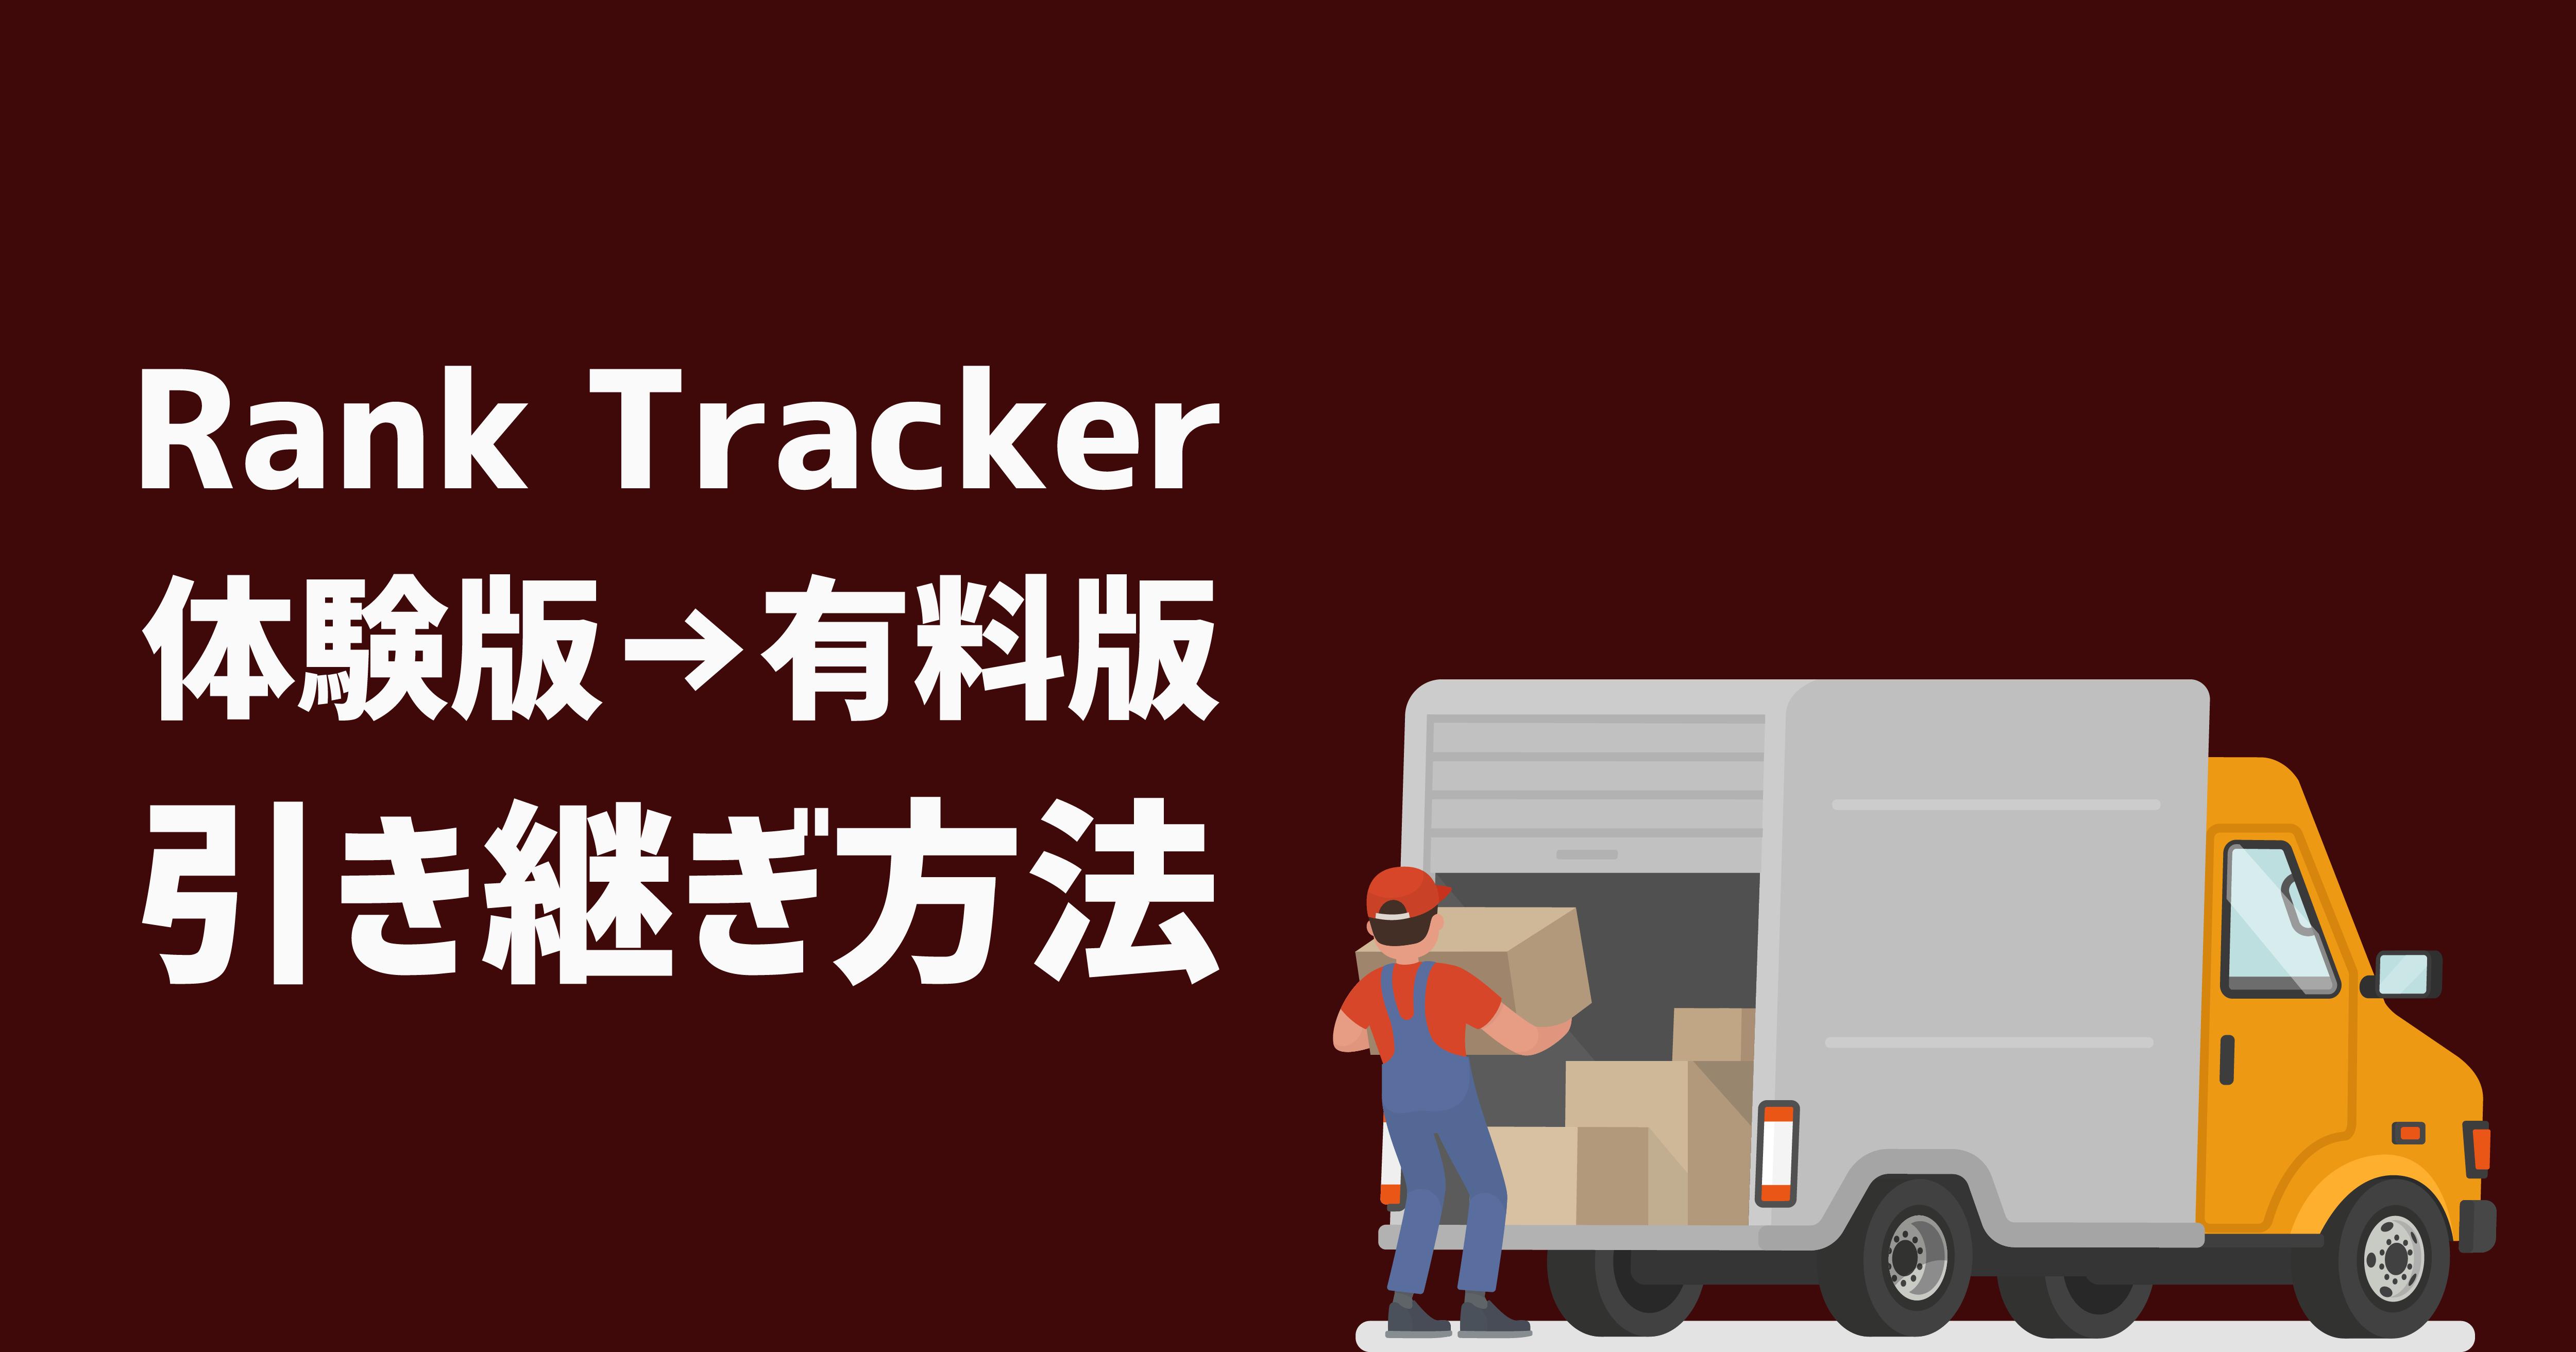 RankTracker体験版→有料版引き継ぎ方法